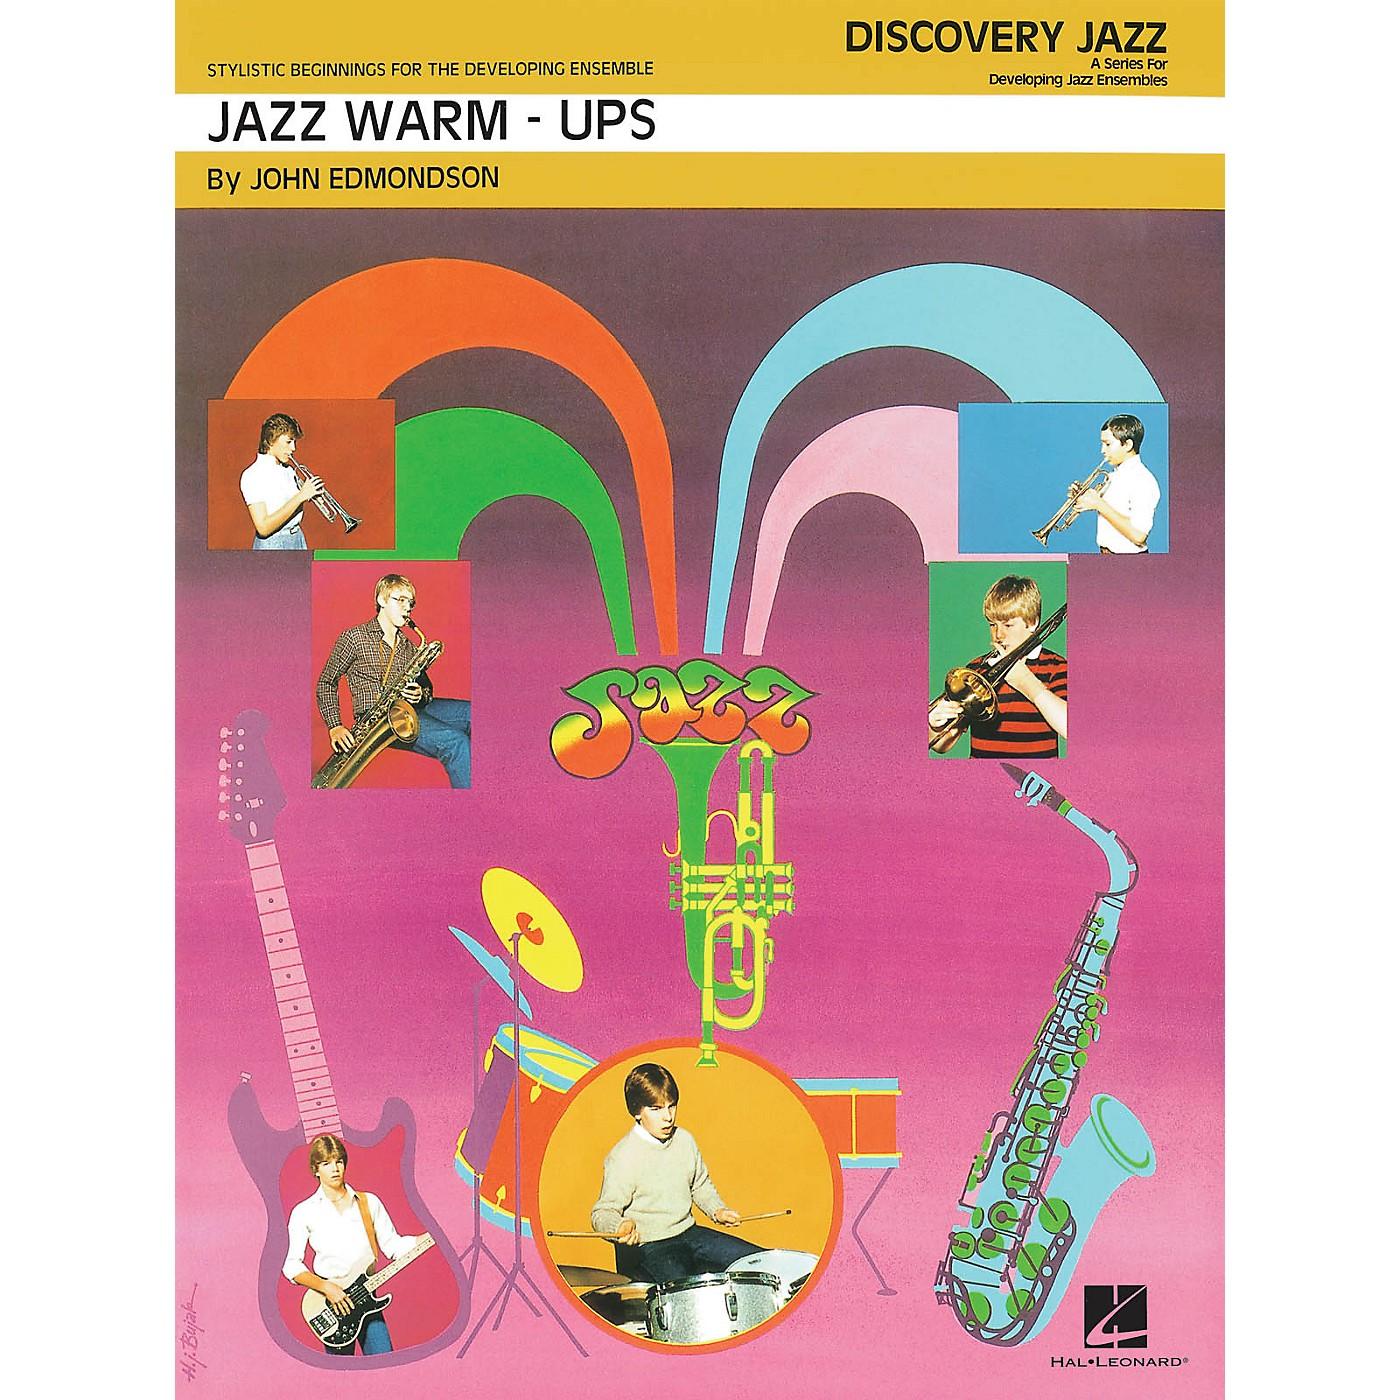 Hal Leonard Jazz Warm-Ups Jazz Band Level 1 Arranged by John Edmondson thumbnail